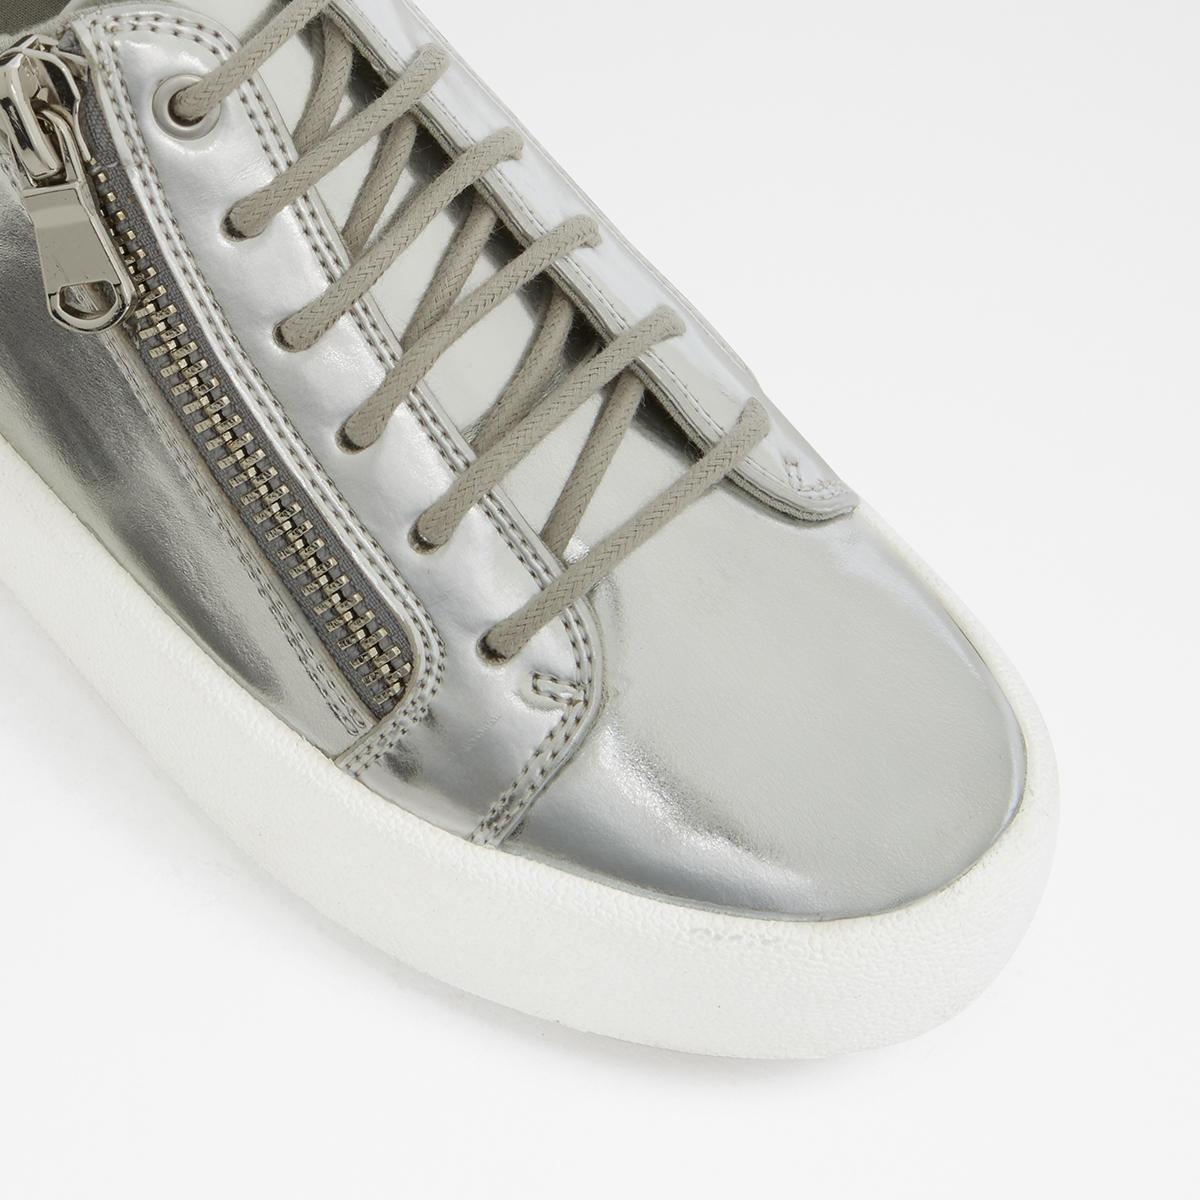 Herschman Silver Damens's Sneakers   Aldoschuhe Aldoschuhe   US 6cae49